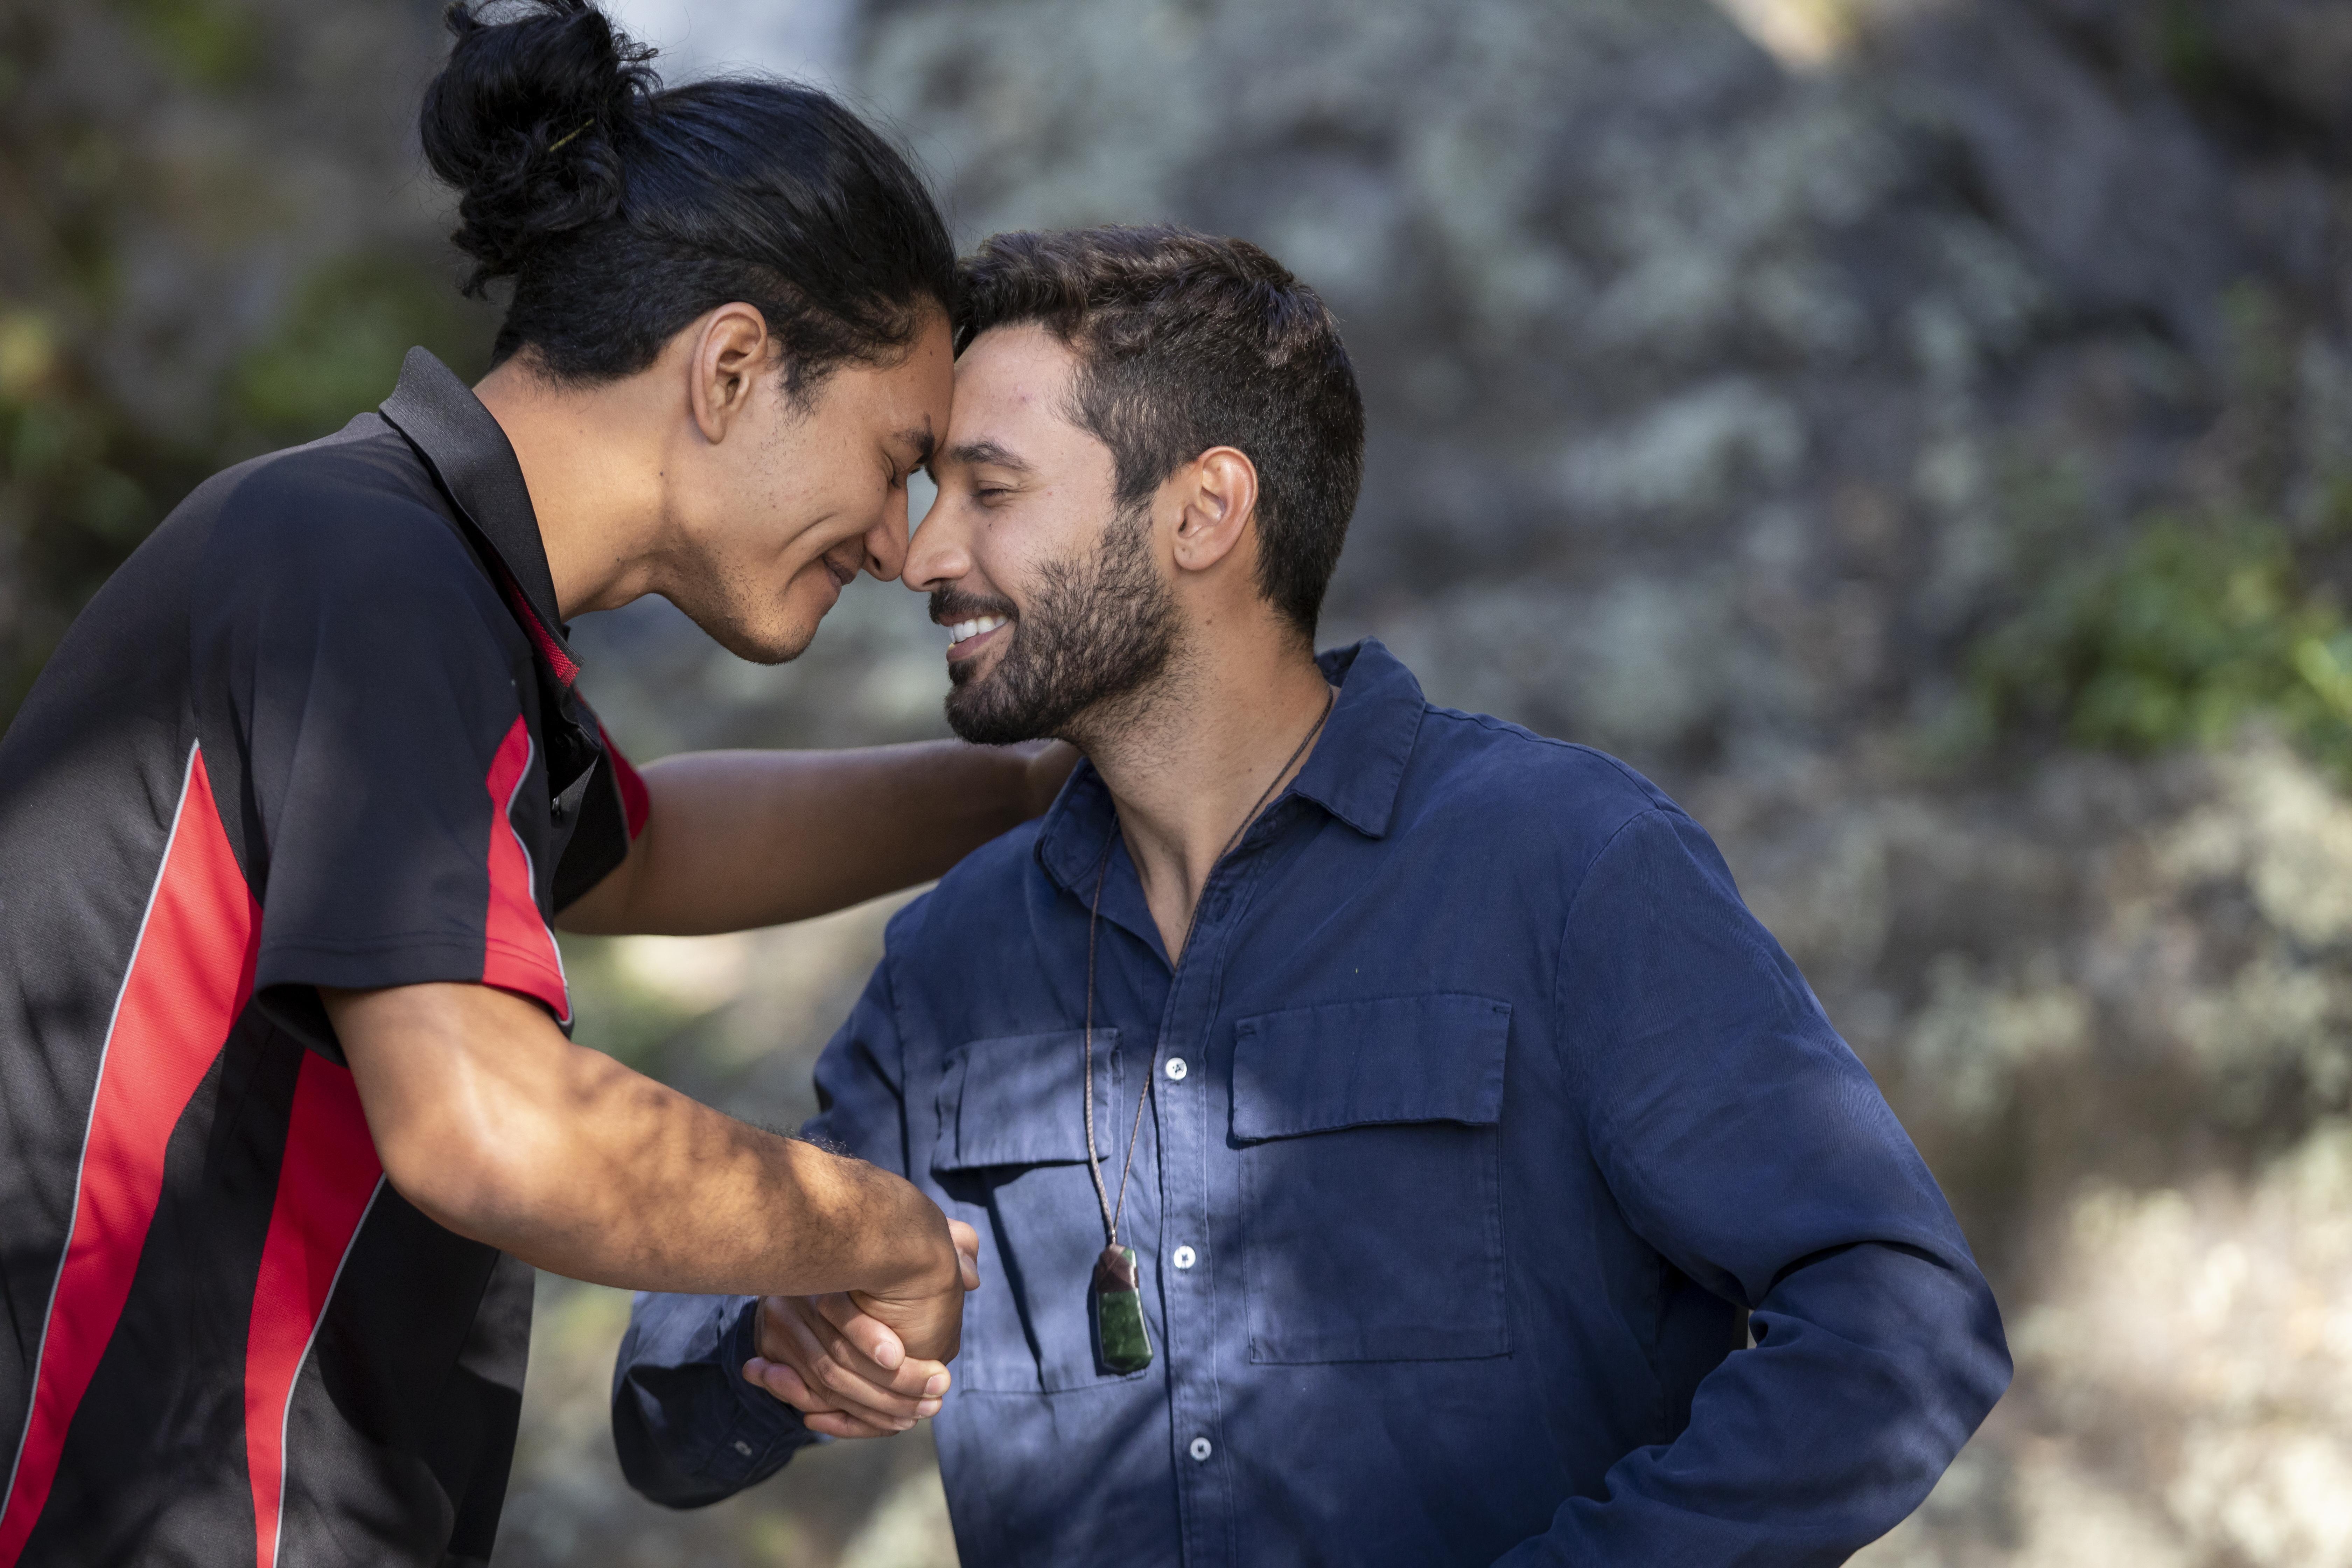 asiatico Dating sito Auckland